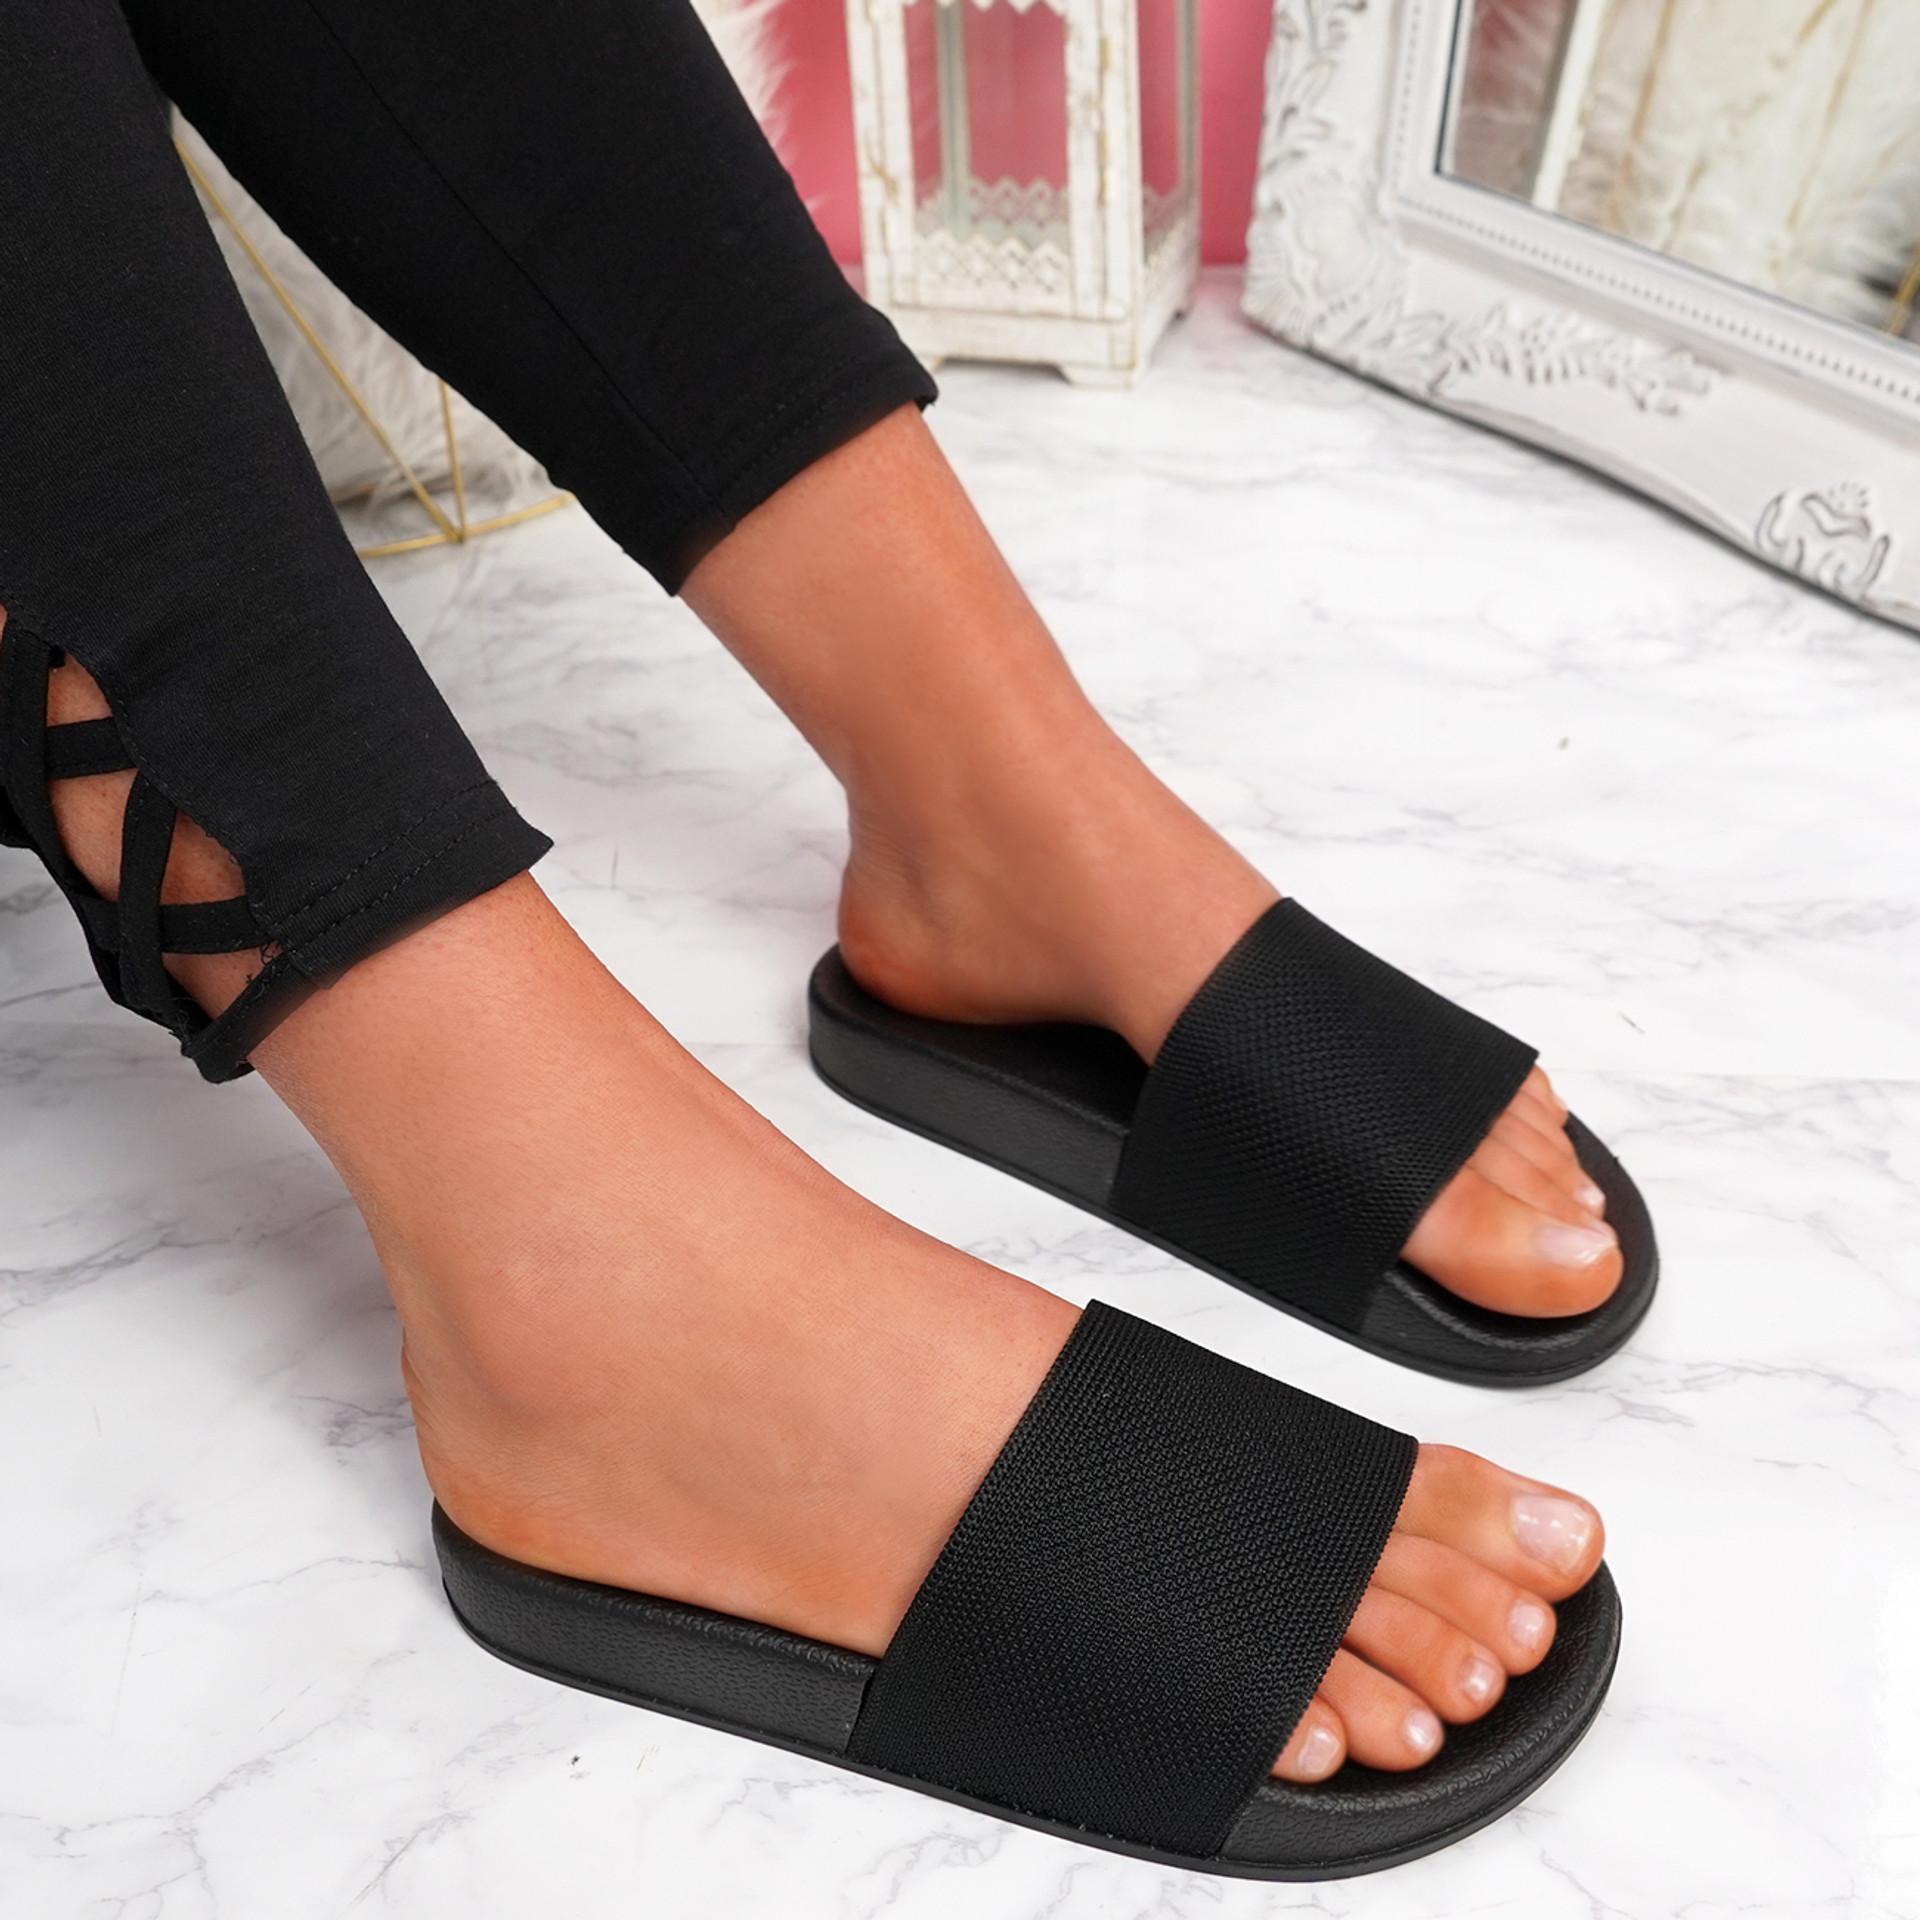 Senny Black Knit Flat Sandals